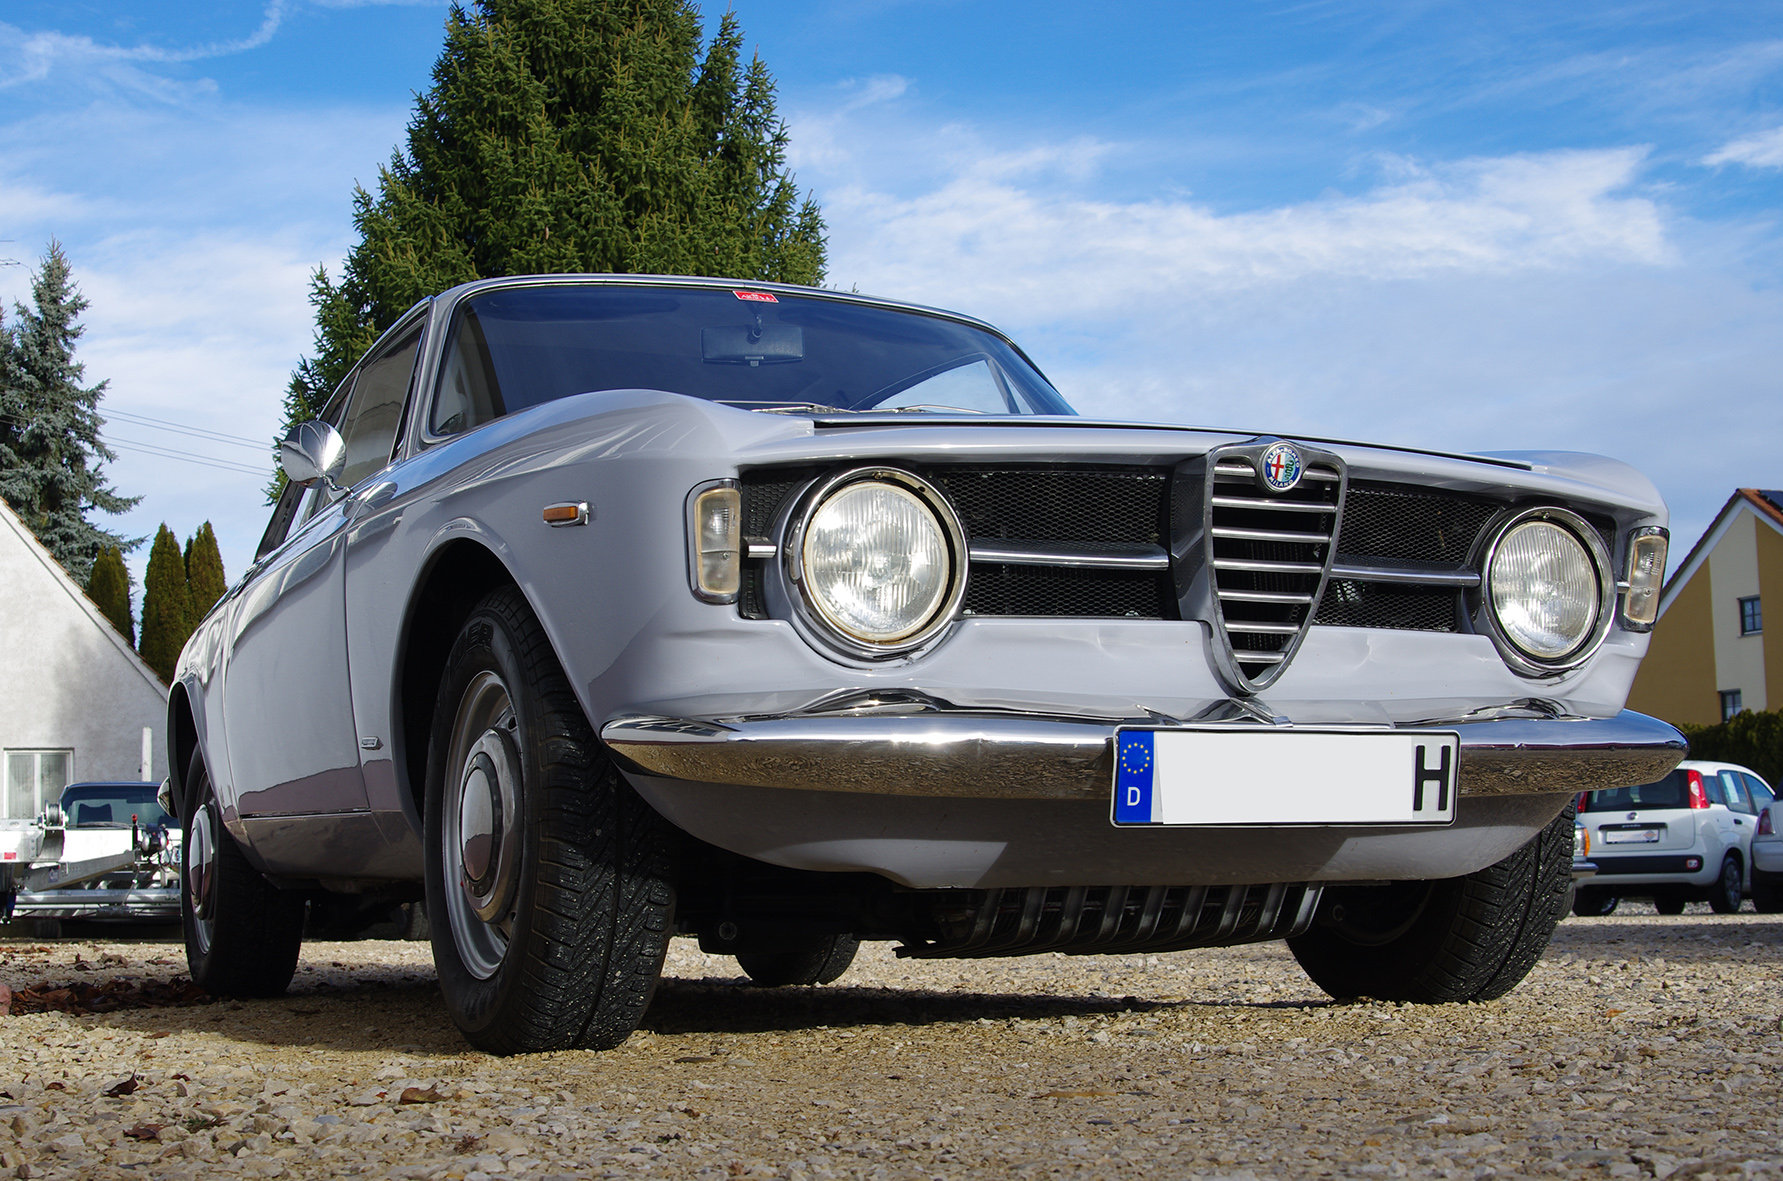 1967 Alfa Romeo Giulia GT 1300 Junior *restored* UK delivery poss SOLD (picture 2 of 6)